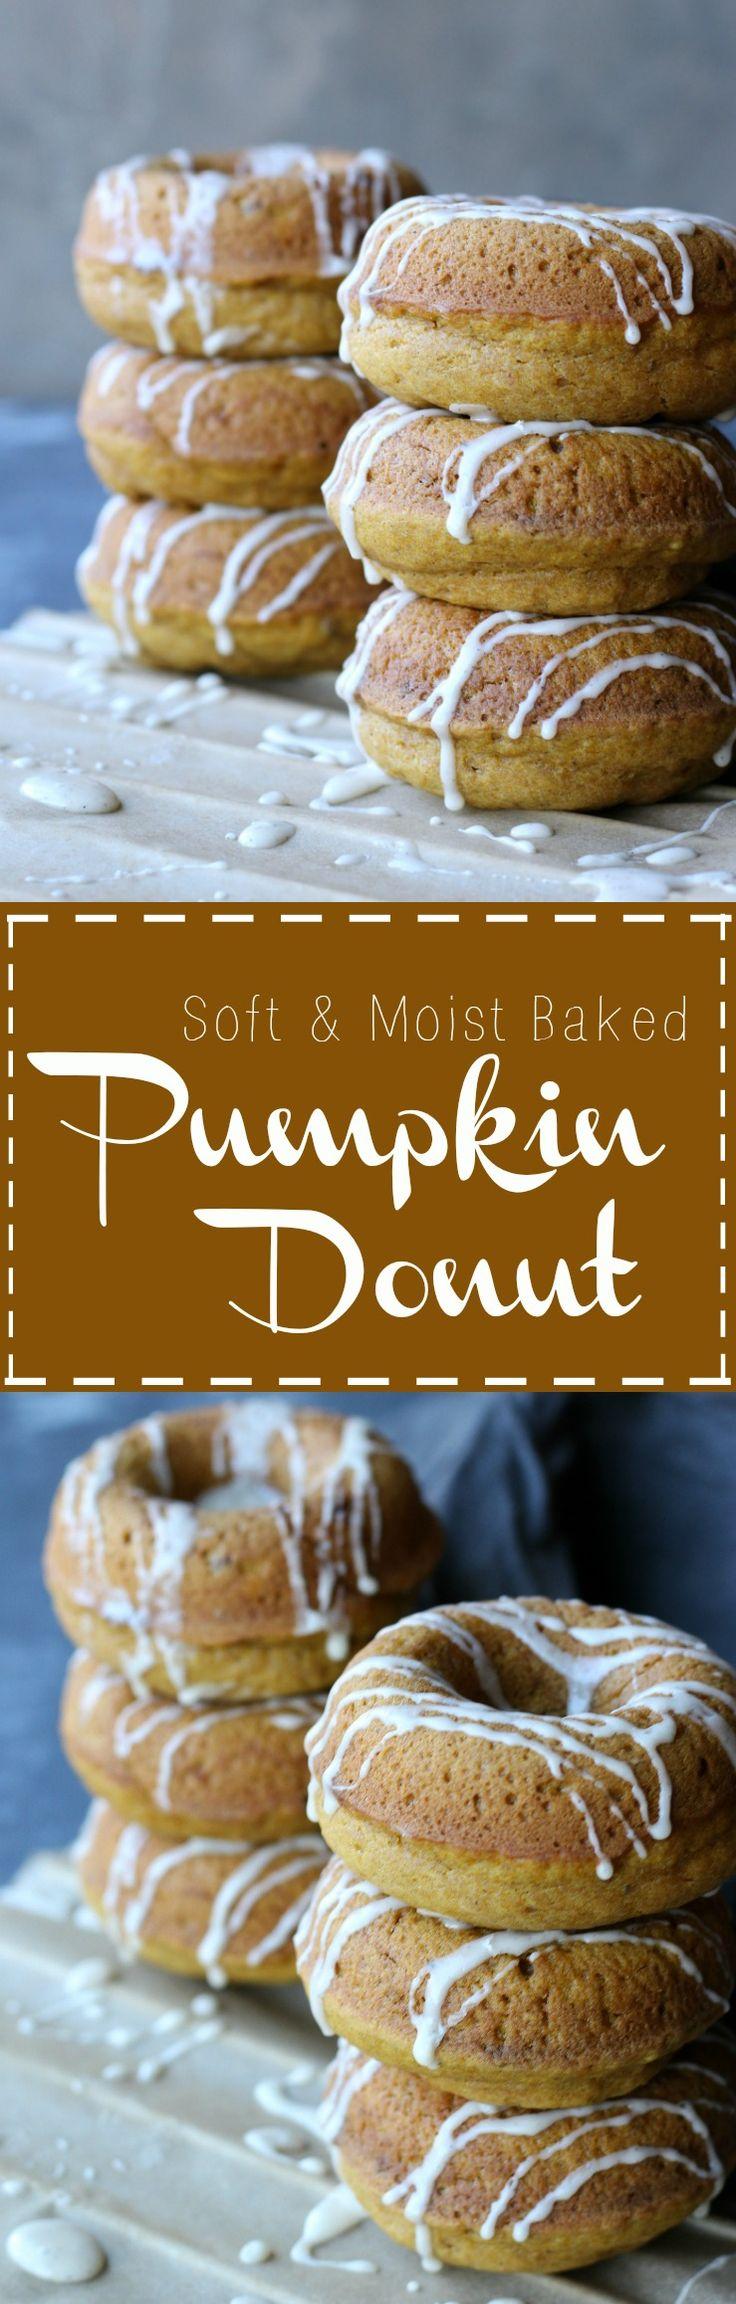 Soft Moist Easy Baked Pumpkin Donuts